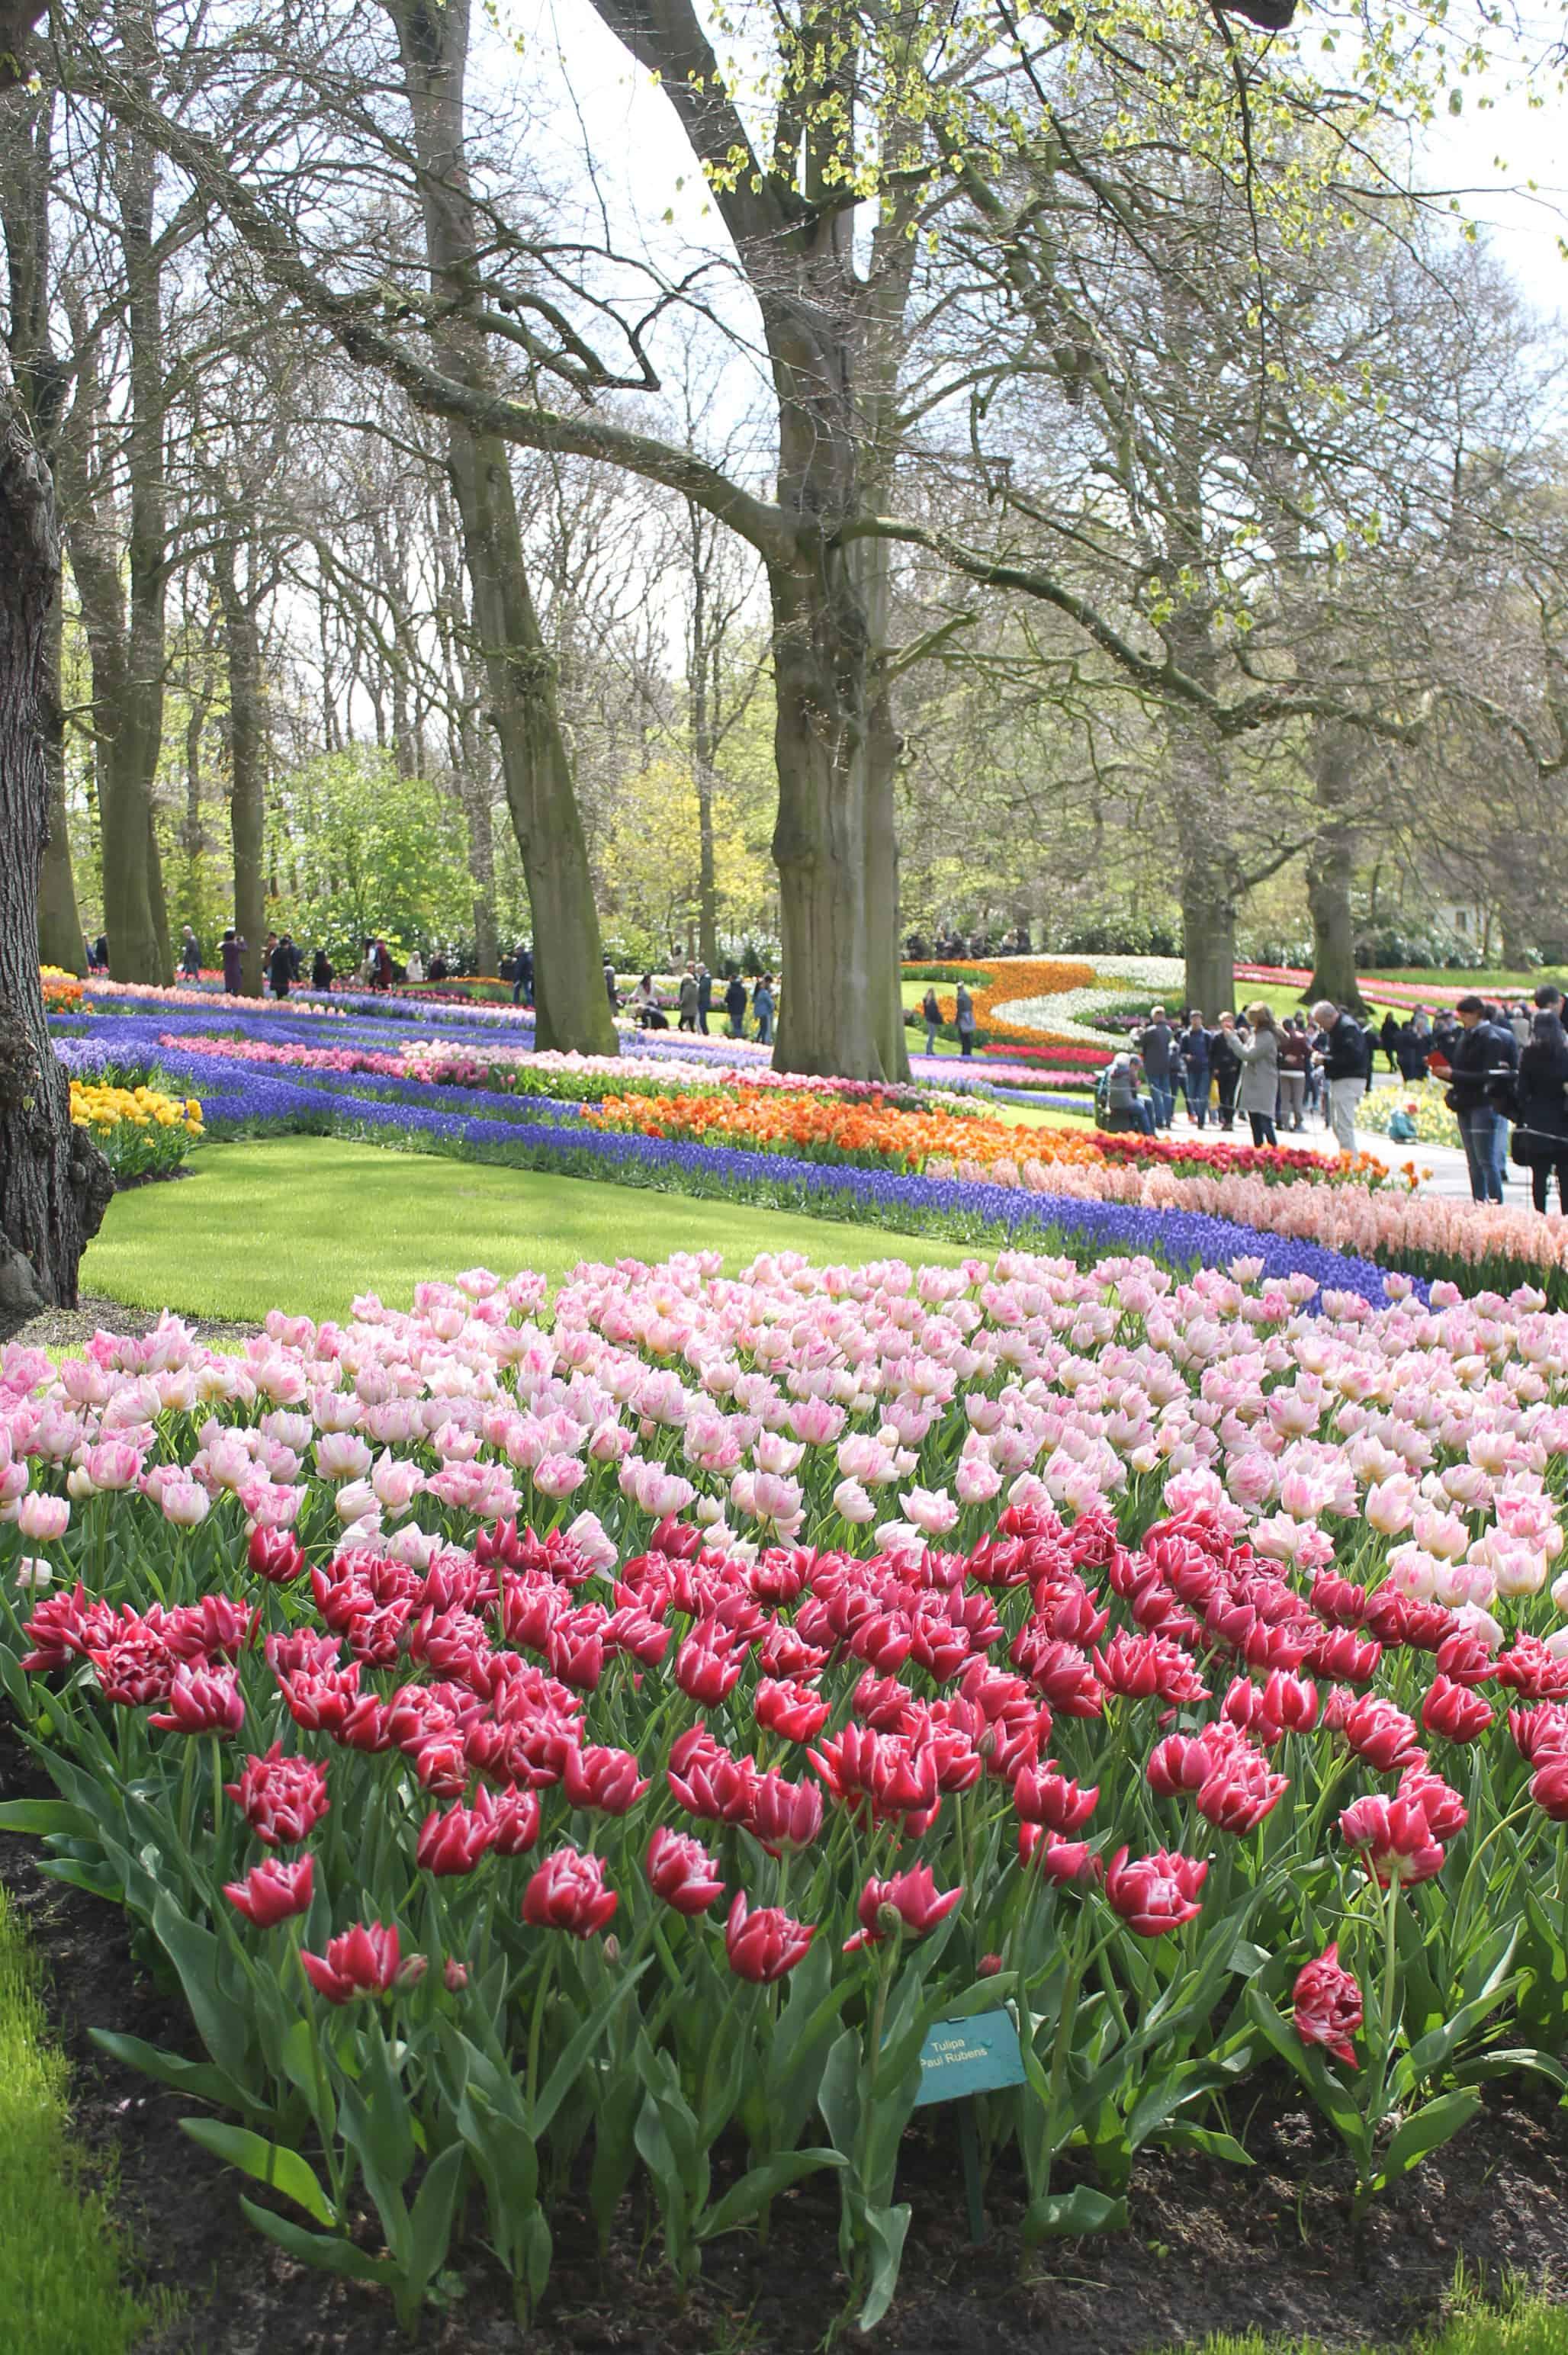 Tulipes aux jardins Keukenhof, Pays-Bas